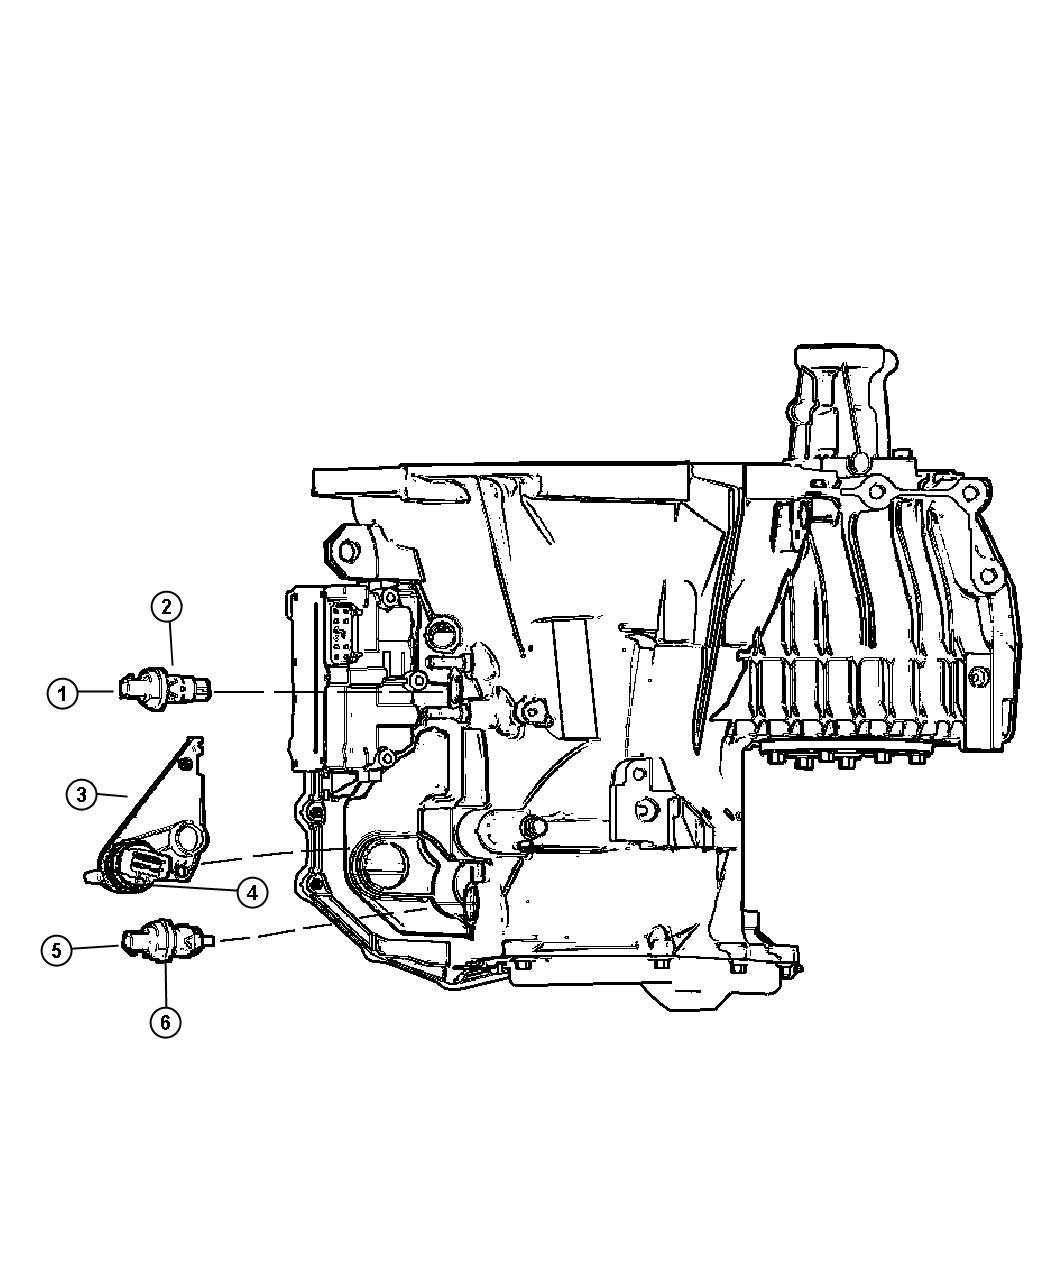 2007 dodge caliber ac wiring diagram 1992 club car sensor.neutral safety switch.chrysler,dodge,jeep,plymouth 99-12.mopar04659677ac | ebay